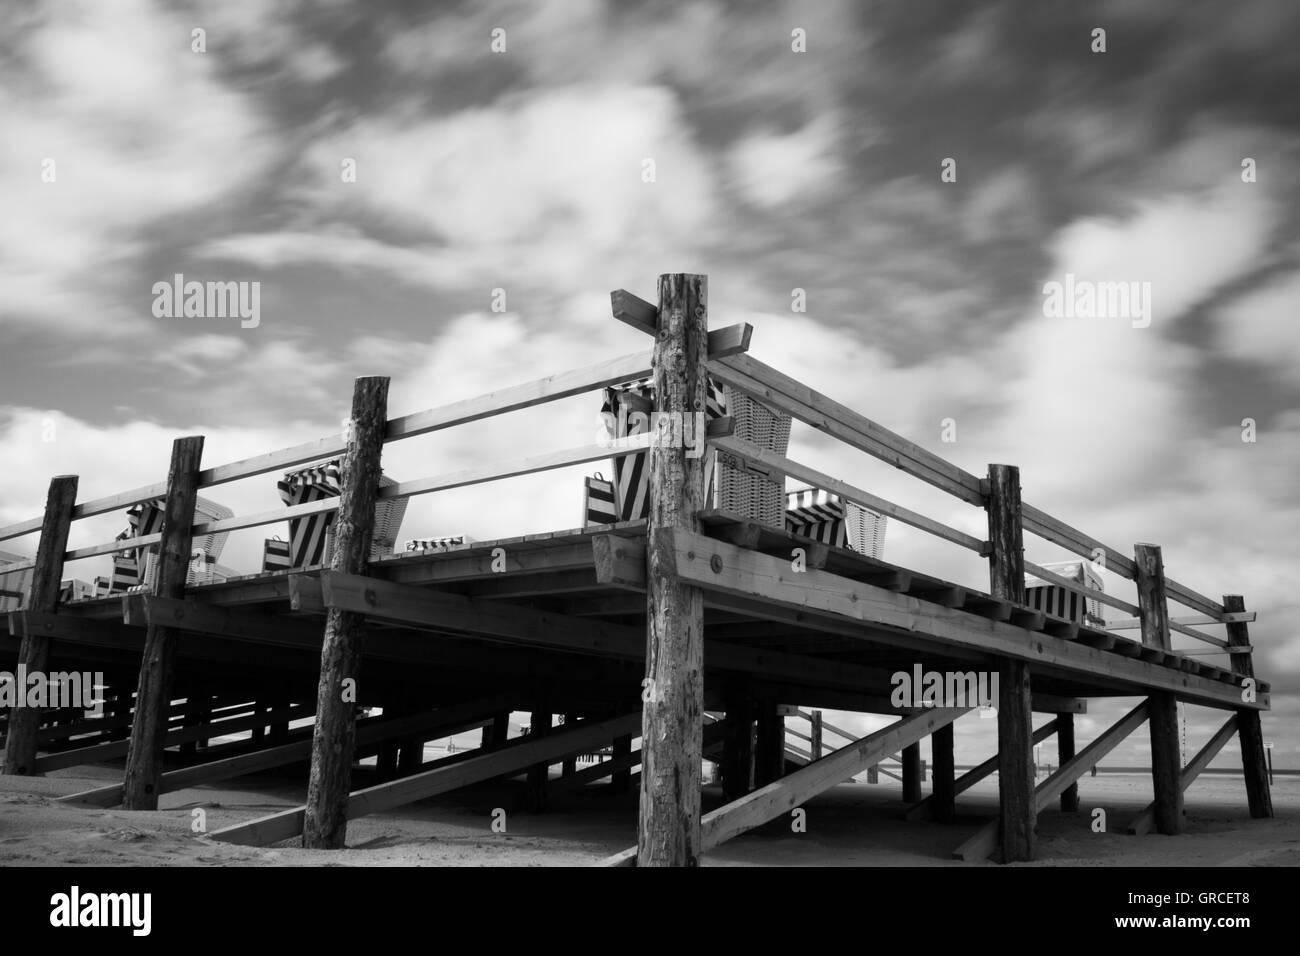 Beach Chairs - Stock Image